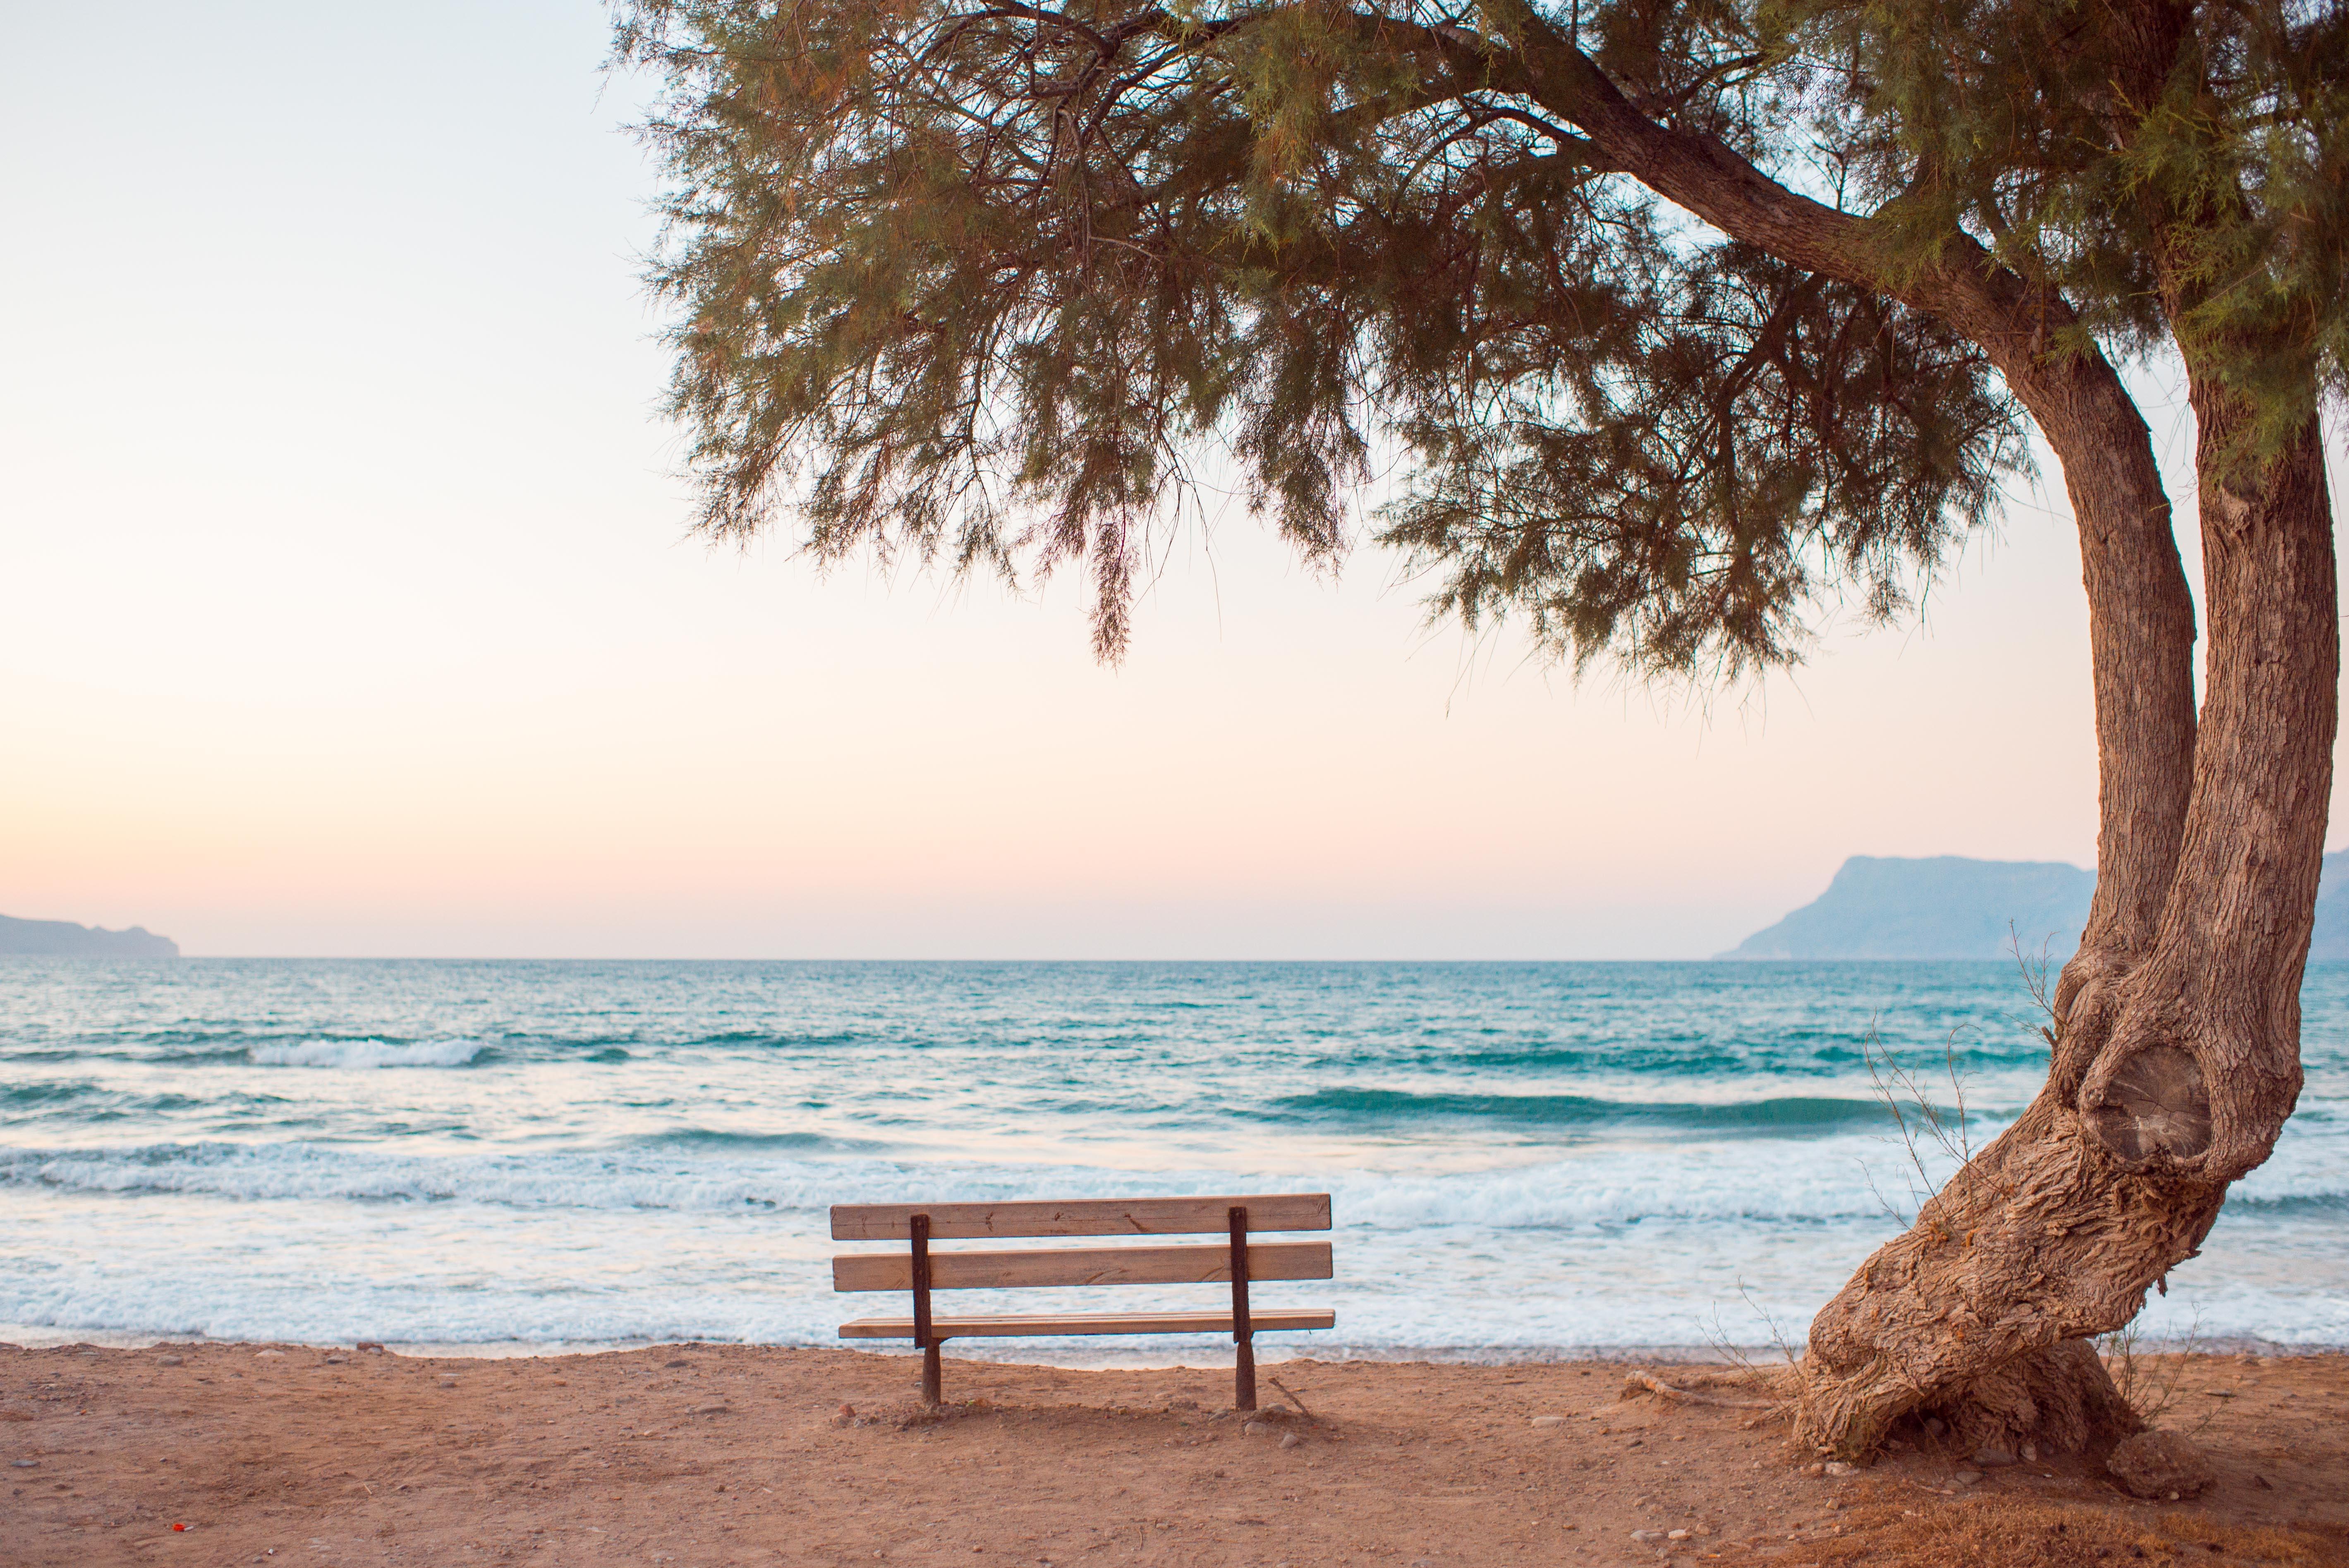 brown bench near seashore